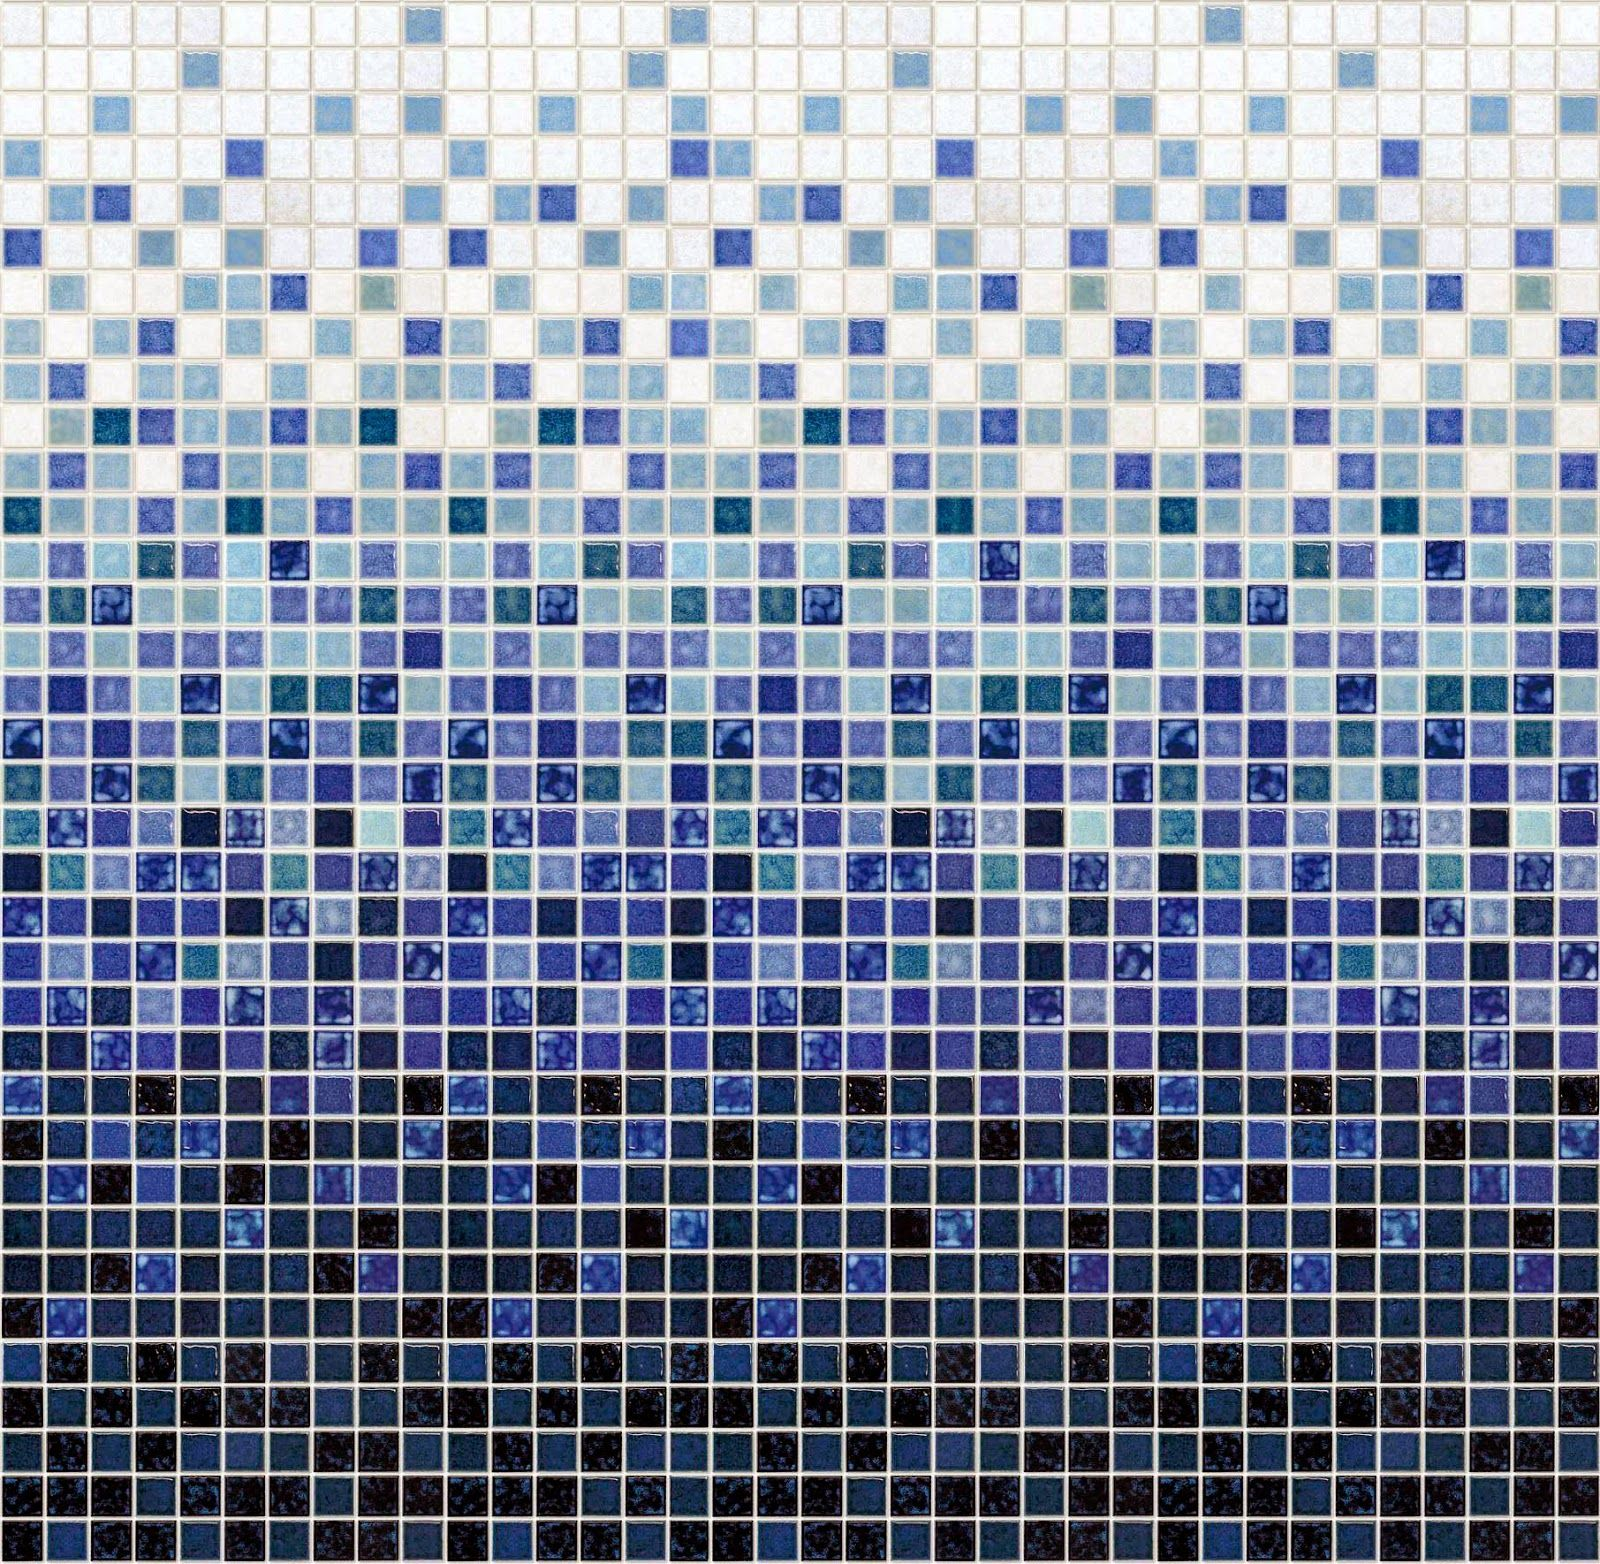 Texture seamless mosaic | Texture mosaic | Pinterest ...